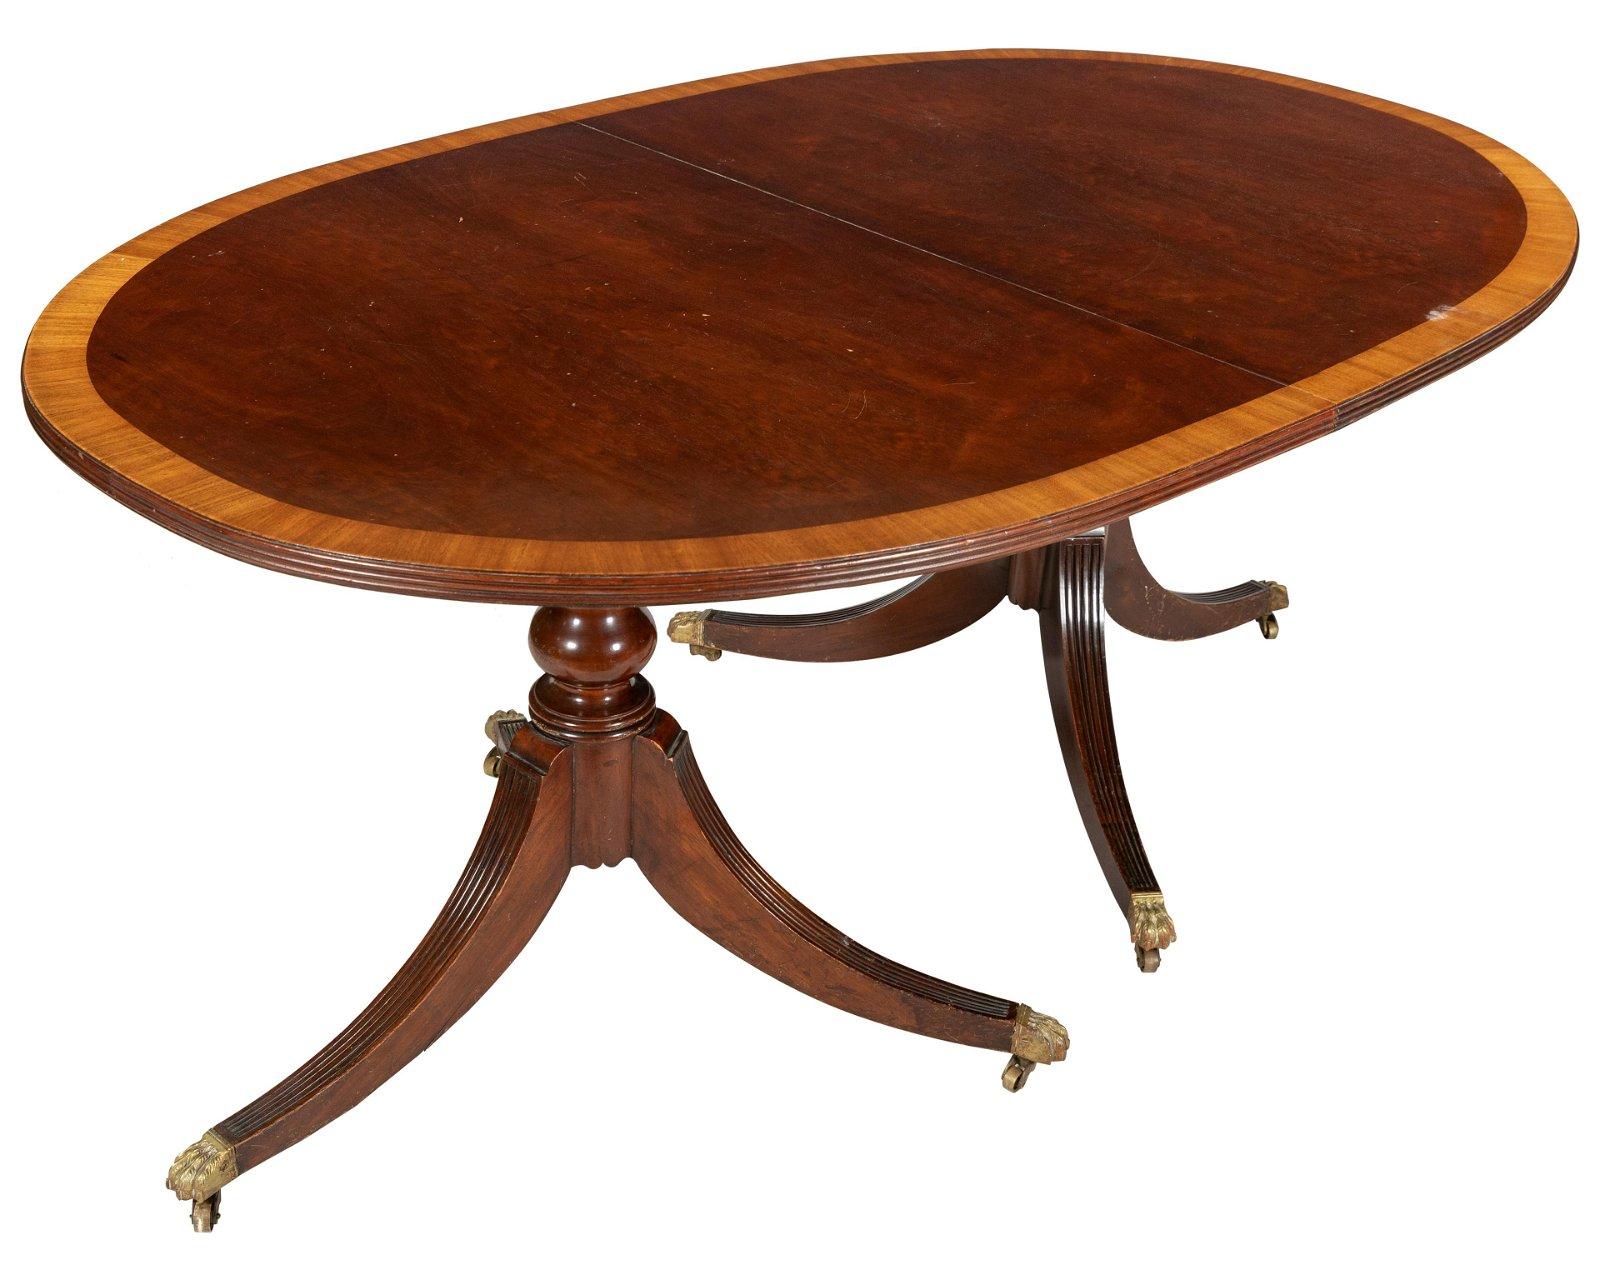 Banded Mahogany Dining Table